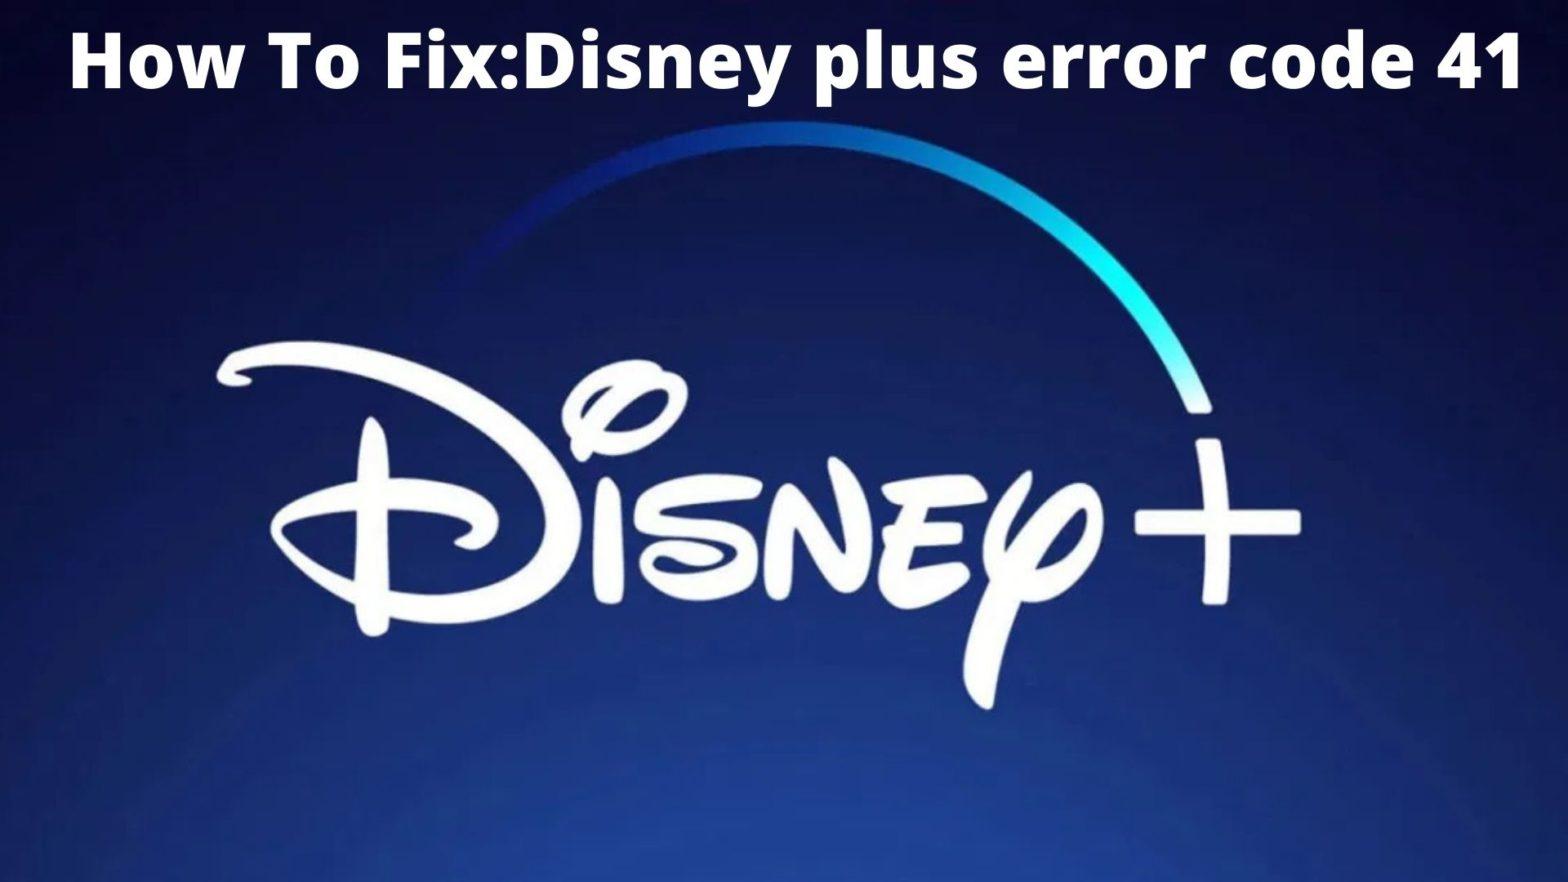 How To Fix Disney plus error code 41